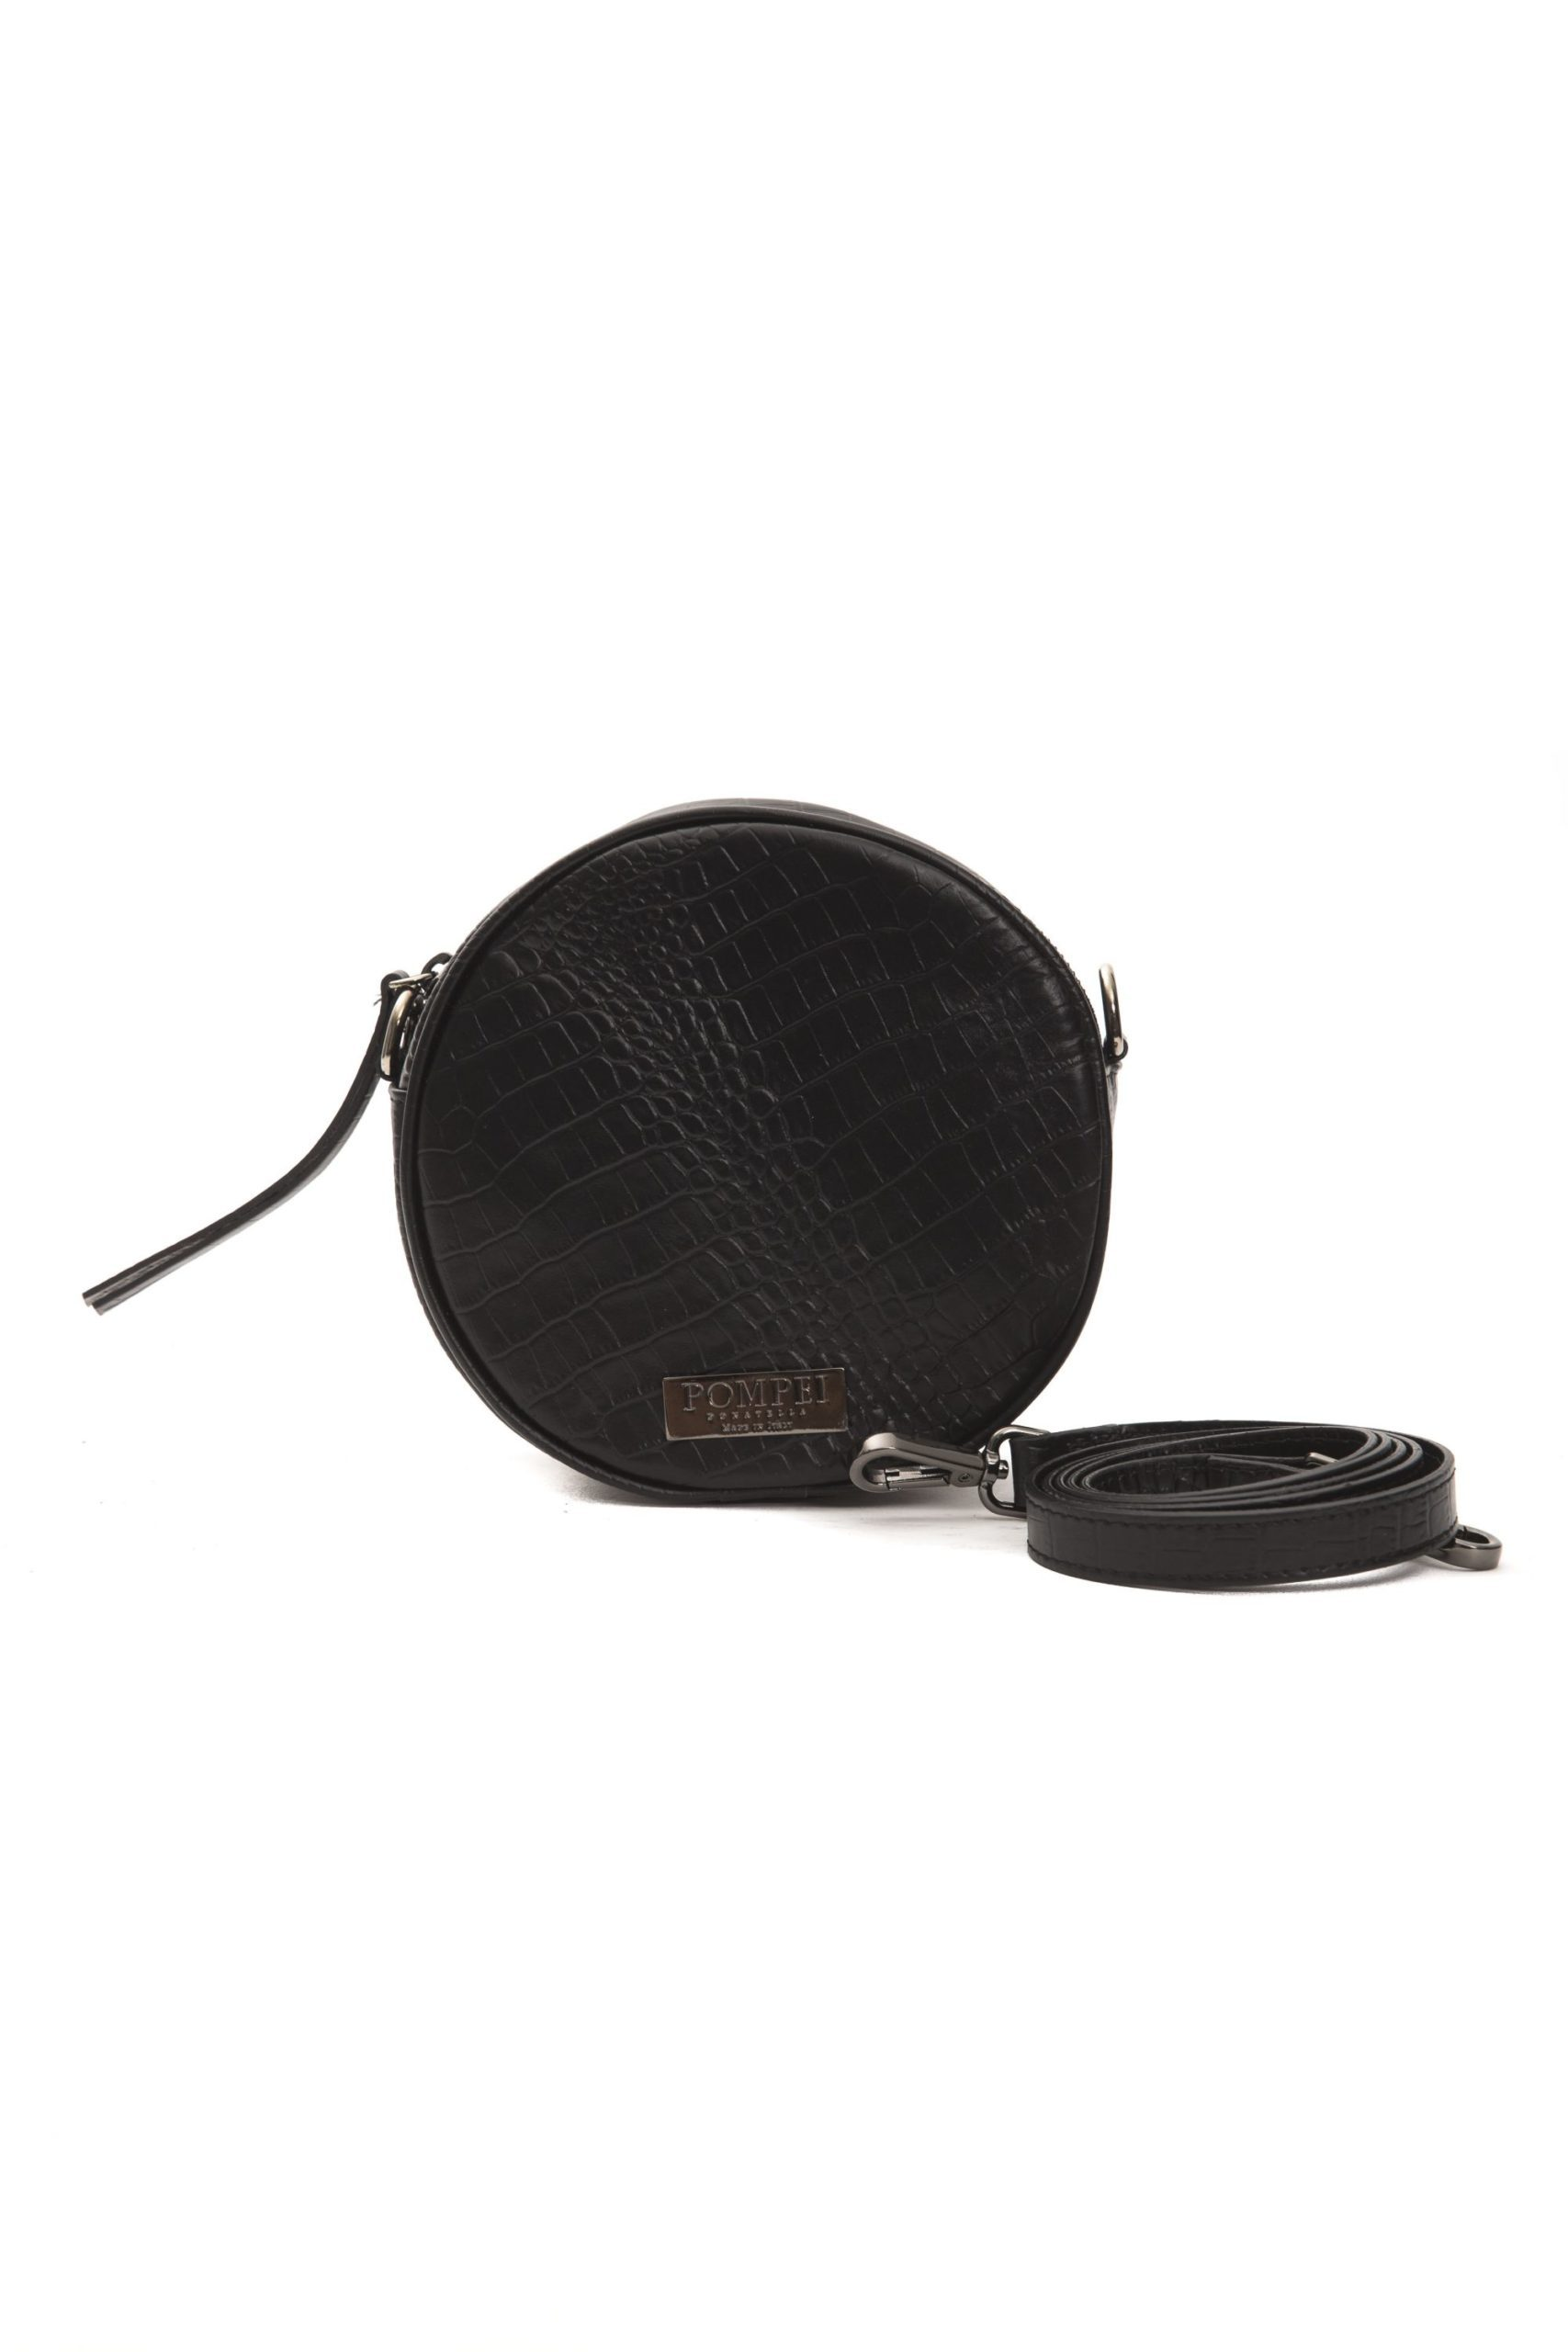 Pompei Donatella Women's Nero Crossbody Bag Black PO1004371